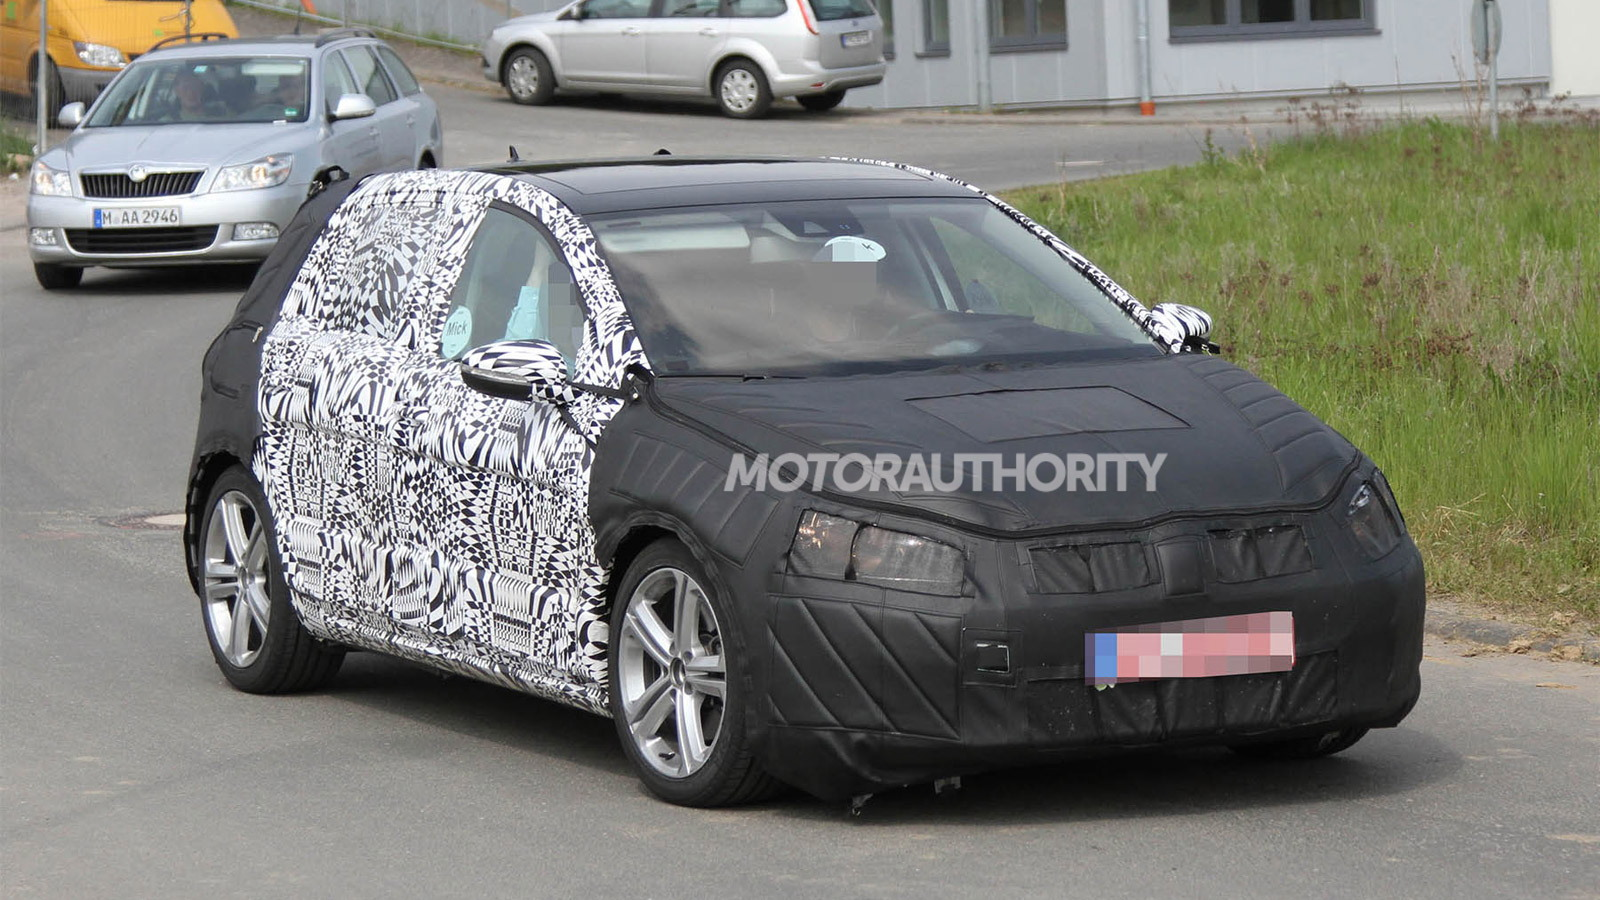 2014 Volkswagen Golf (MkVII) spy shots